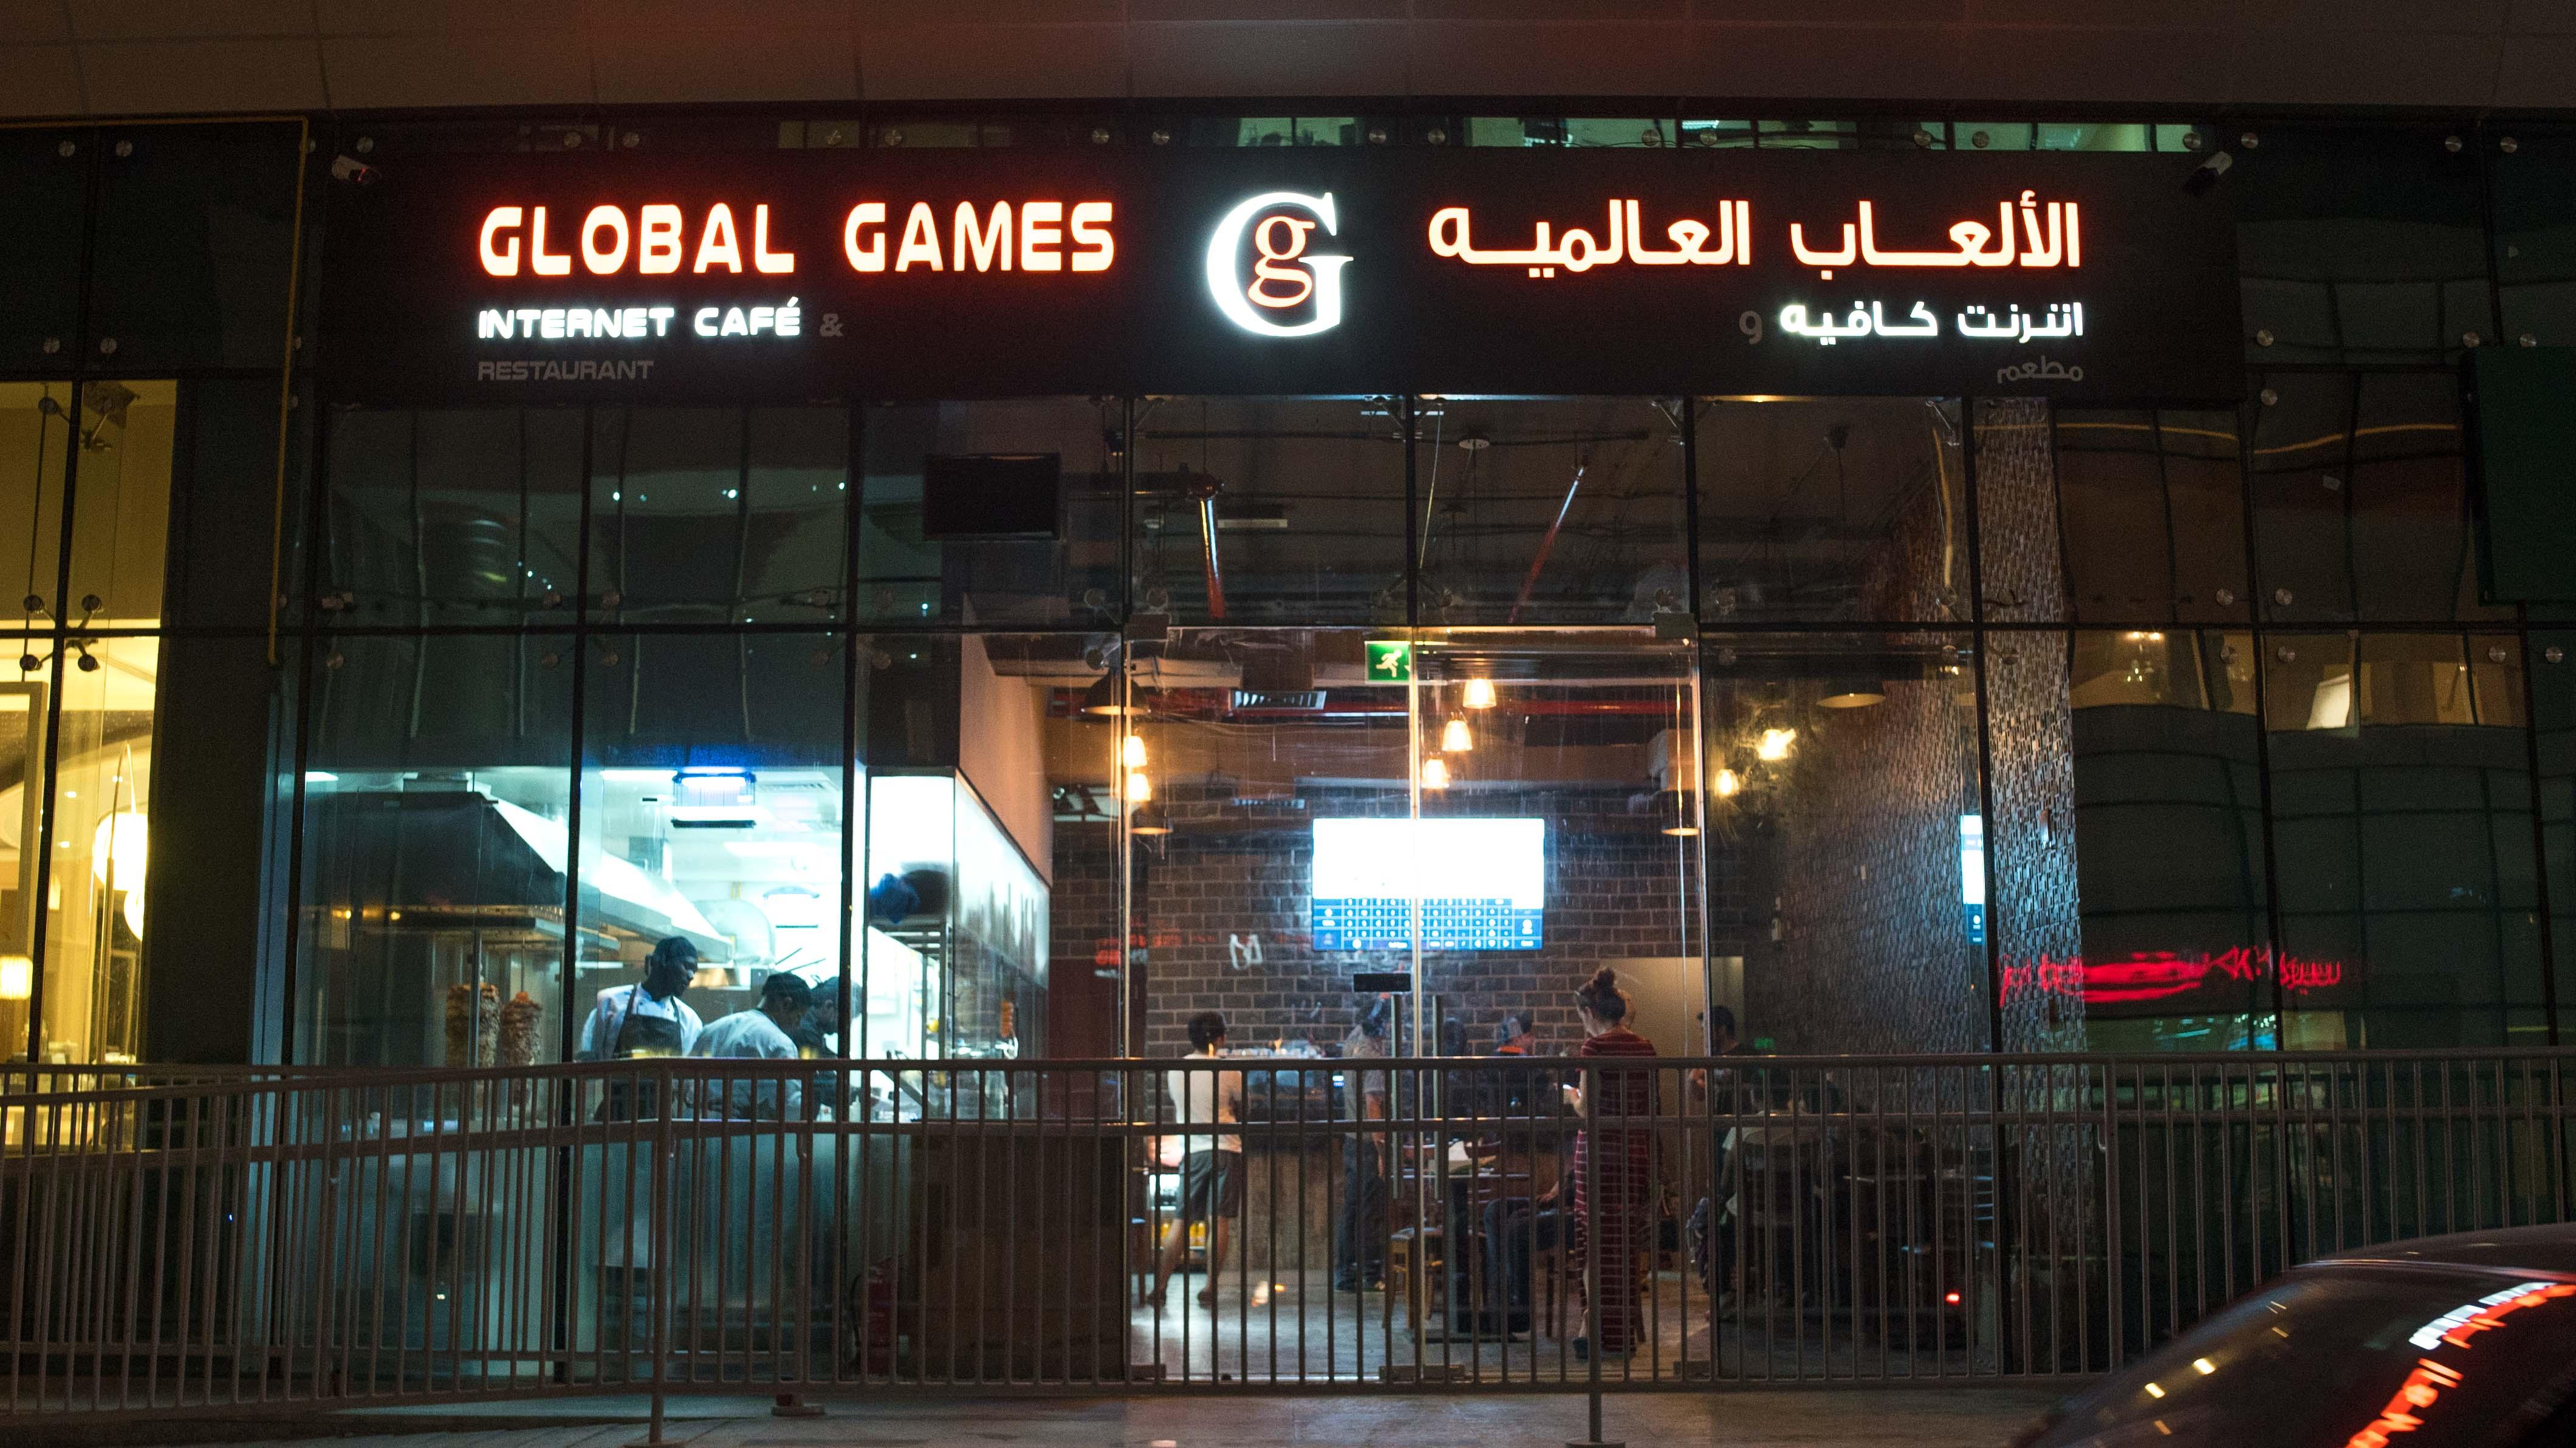 images?q=tbn:ANd9GcQh_l3eQ5xwiPy07kGEXjmjgmBKBRB7H2mRxCGhv1tFWg5c_mWT Get Inspired For Internet Cafe Games @koolgadgetz.com.info